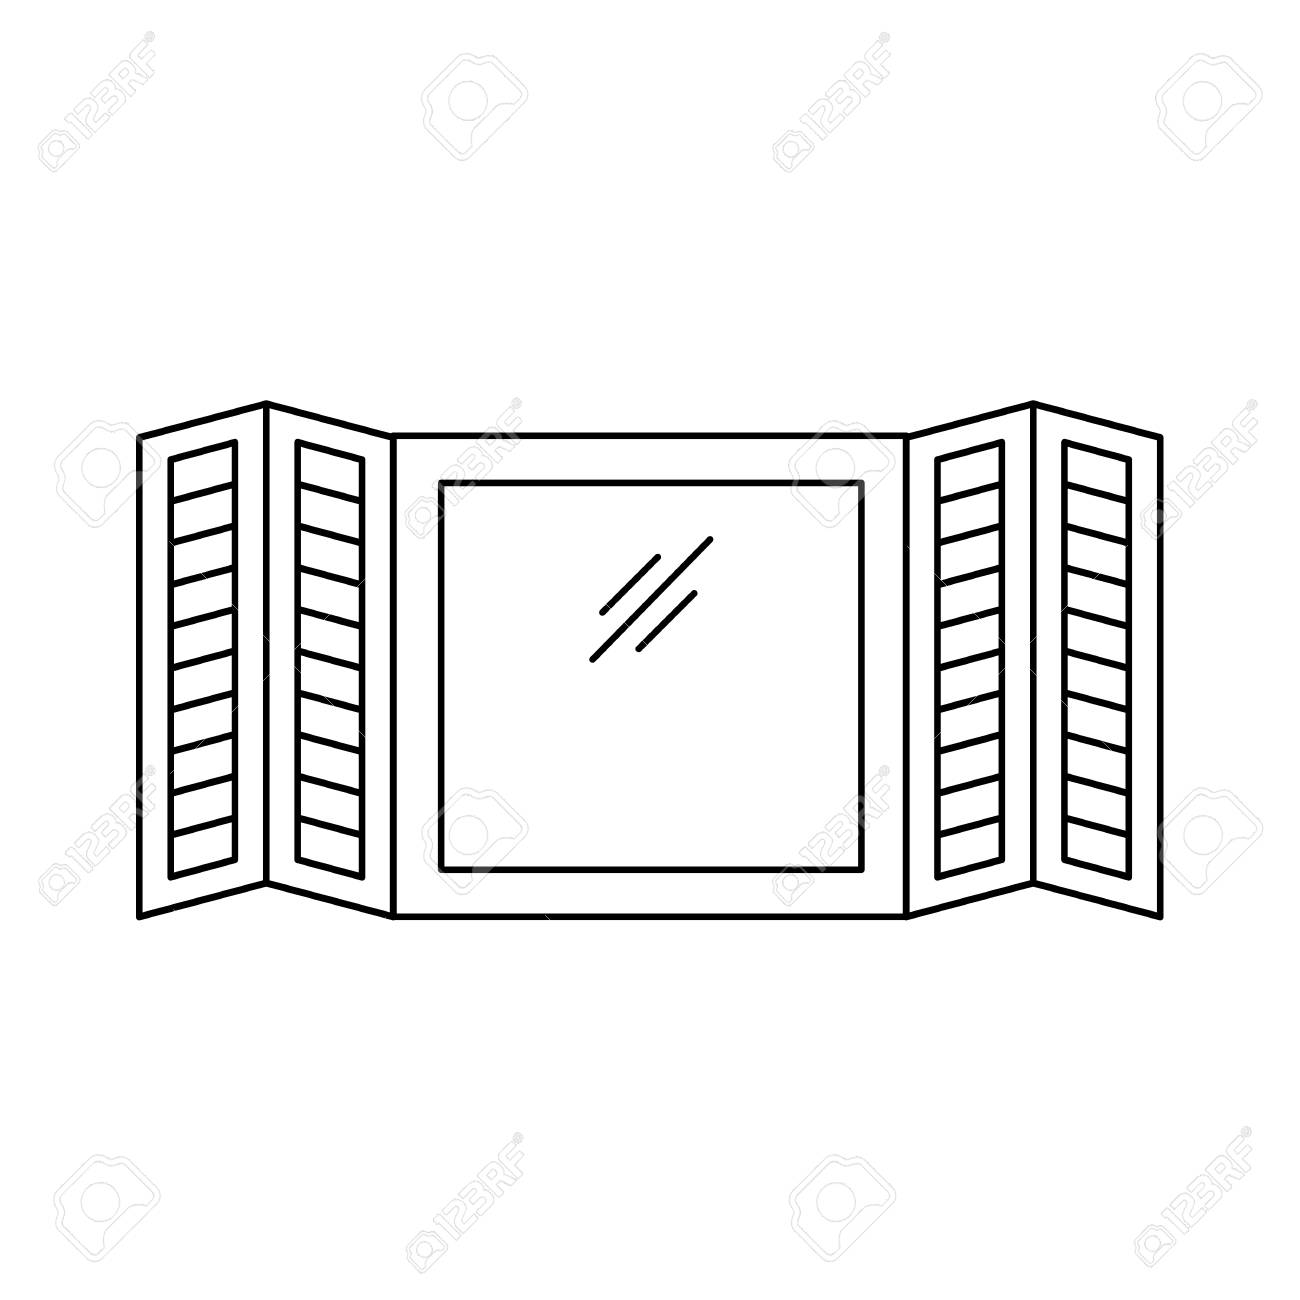 Black White Illustration Of Old Louver Plantation Window Shutter